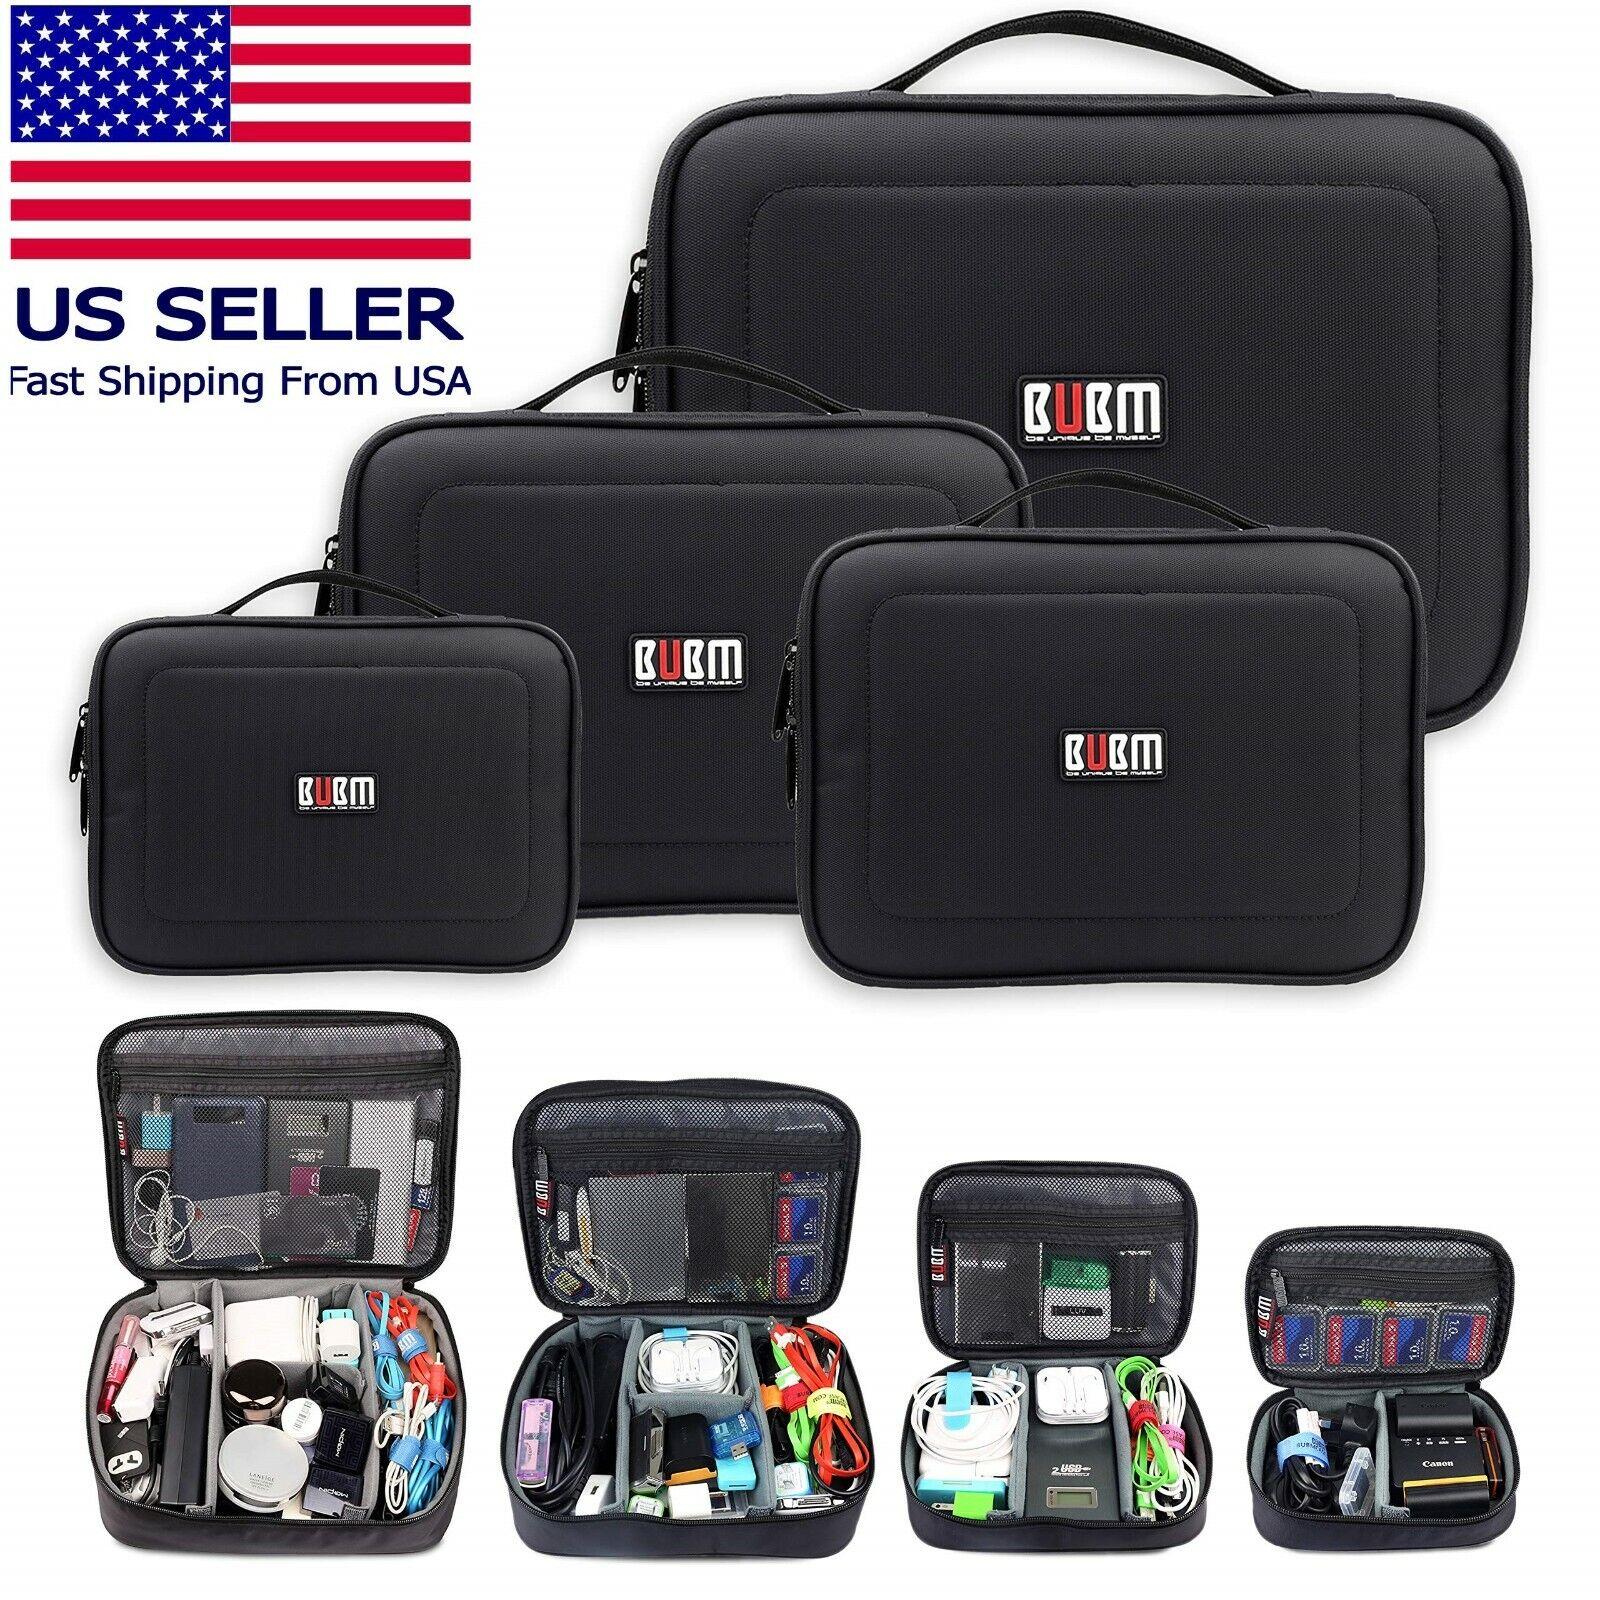 BUBM 4Pc Electronic Travel Case Bag Set Tablets,Phones, Flash Drives, Power Bank Home & Garden